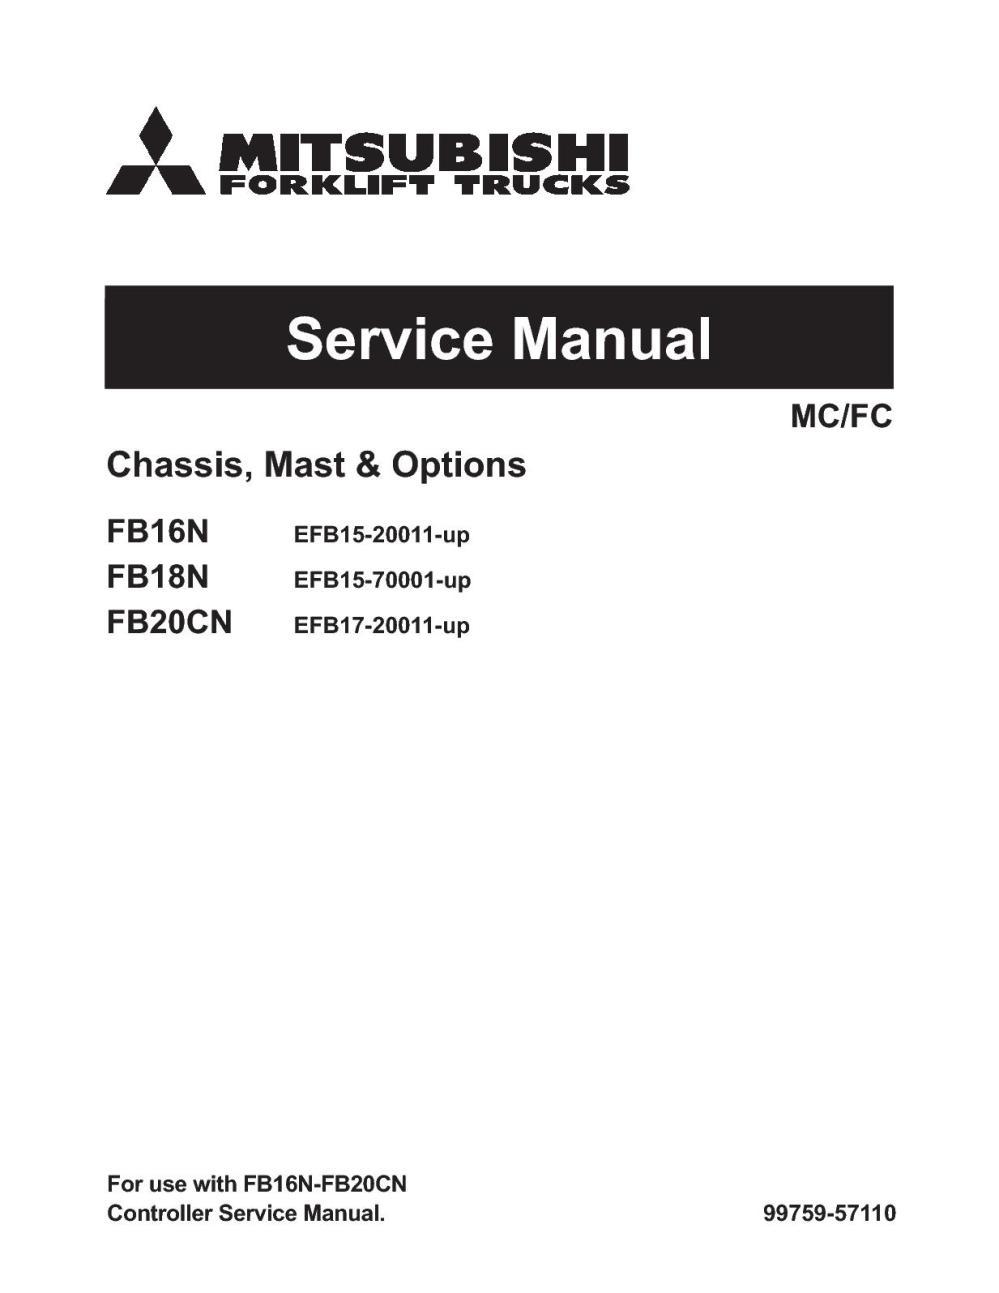 medium resolution of mitsubishi fb16n forklift trucks service repair manual snefb15 20011 up